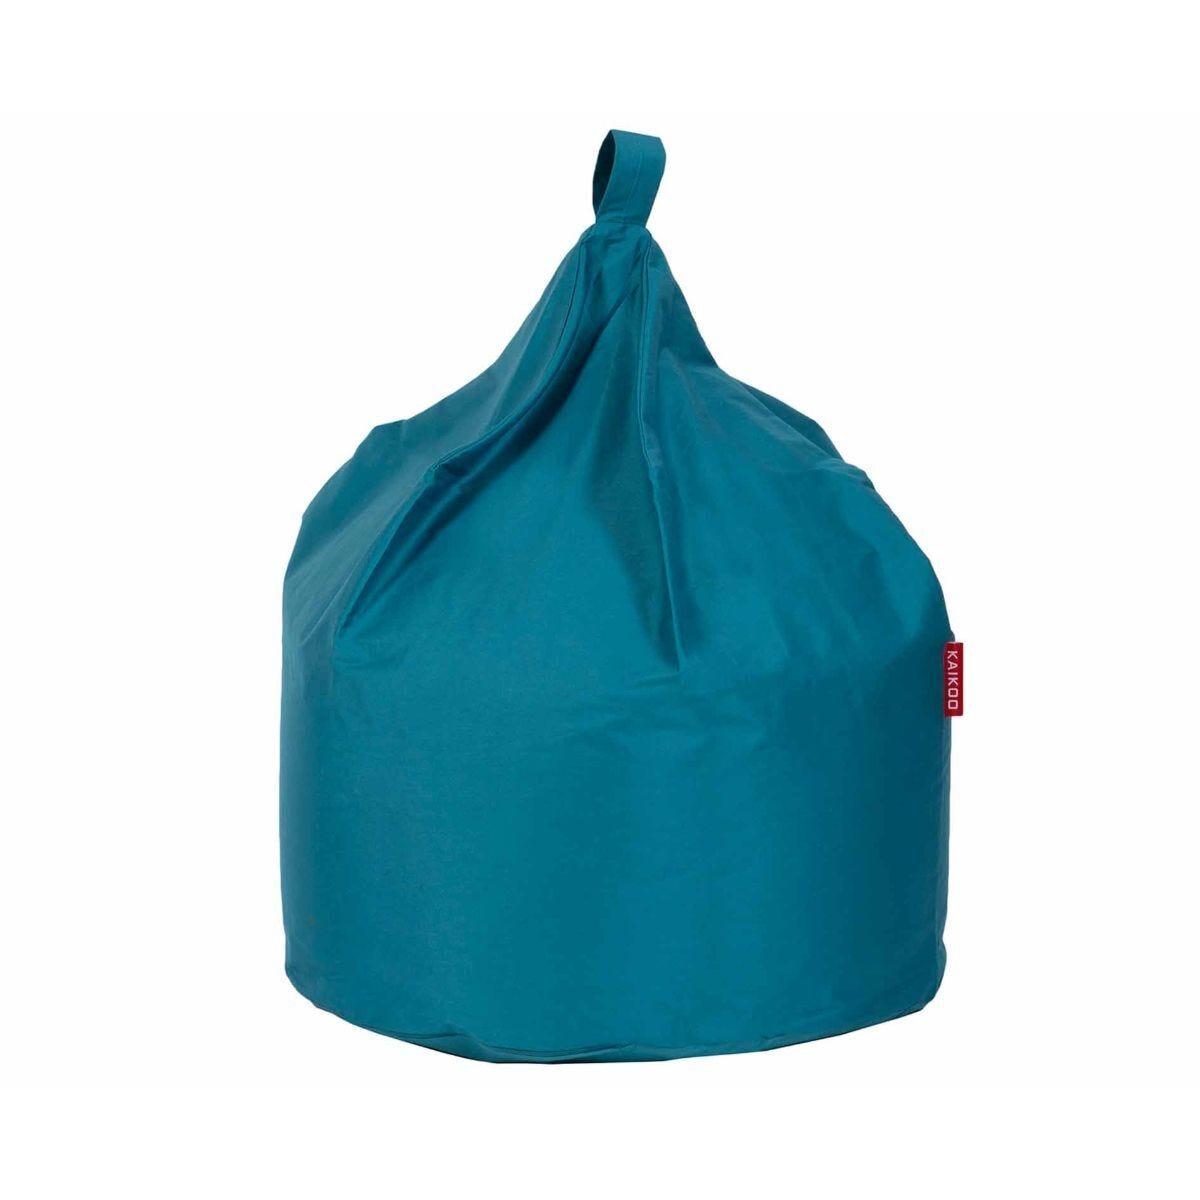 Kaikoo Large Beanbag Teal